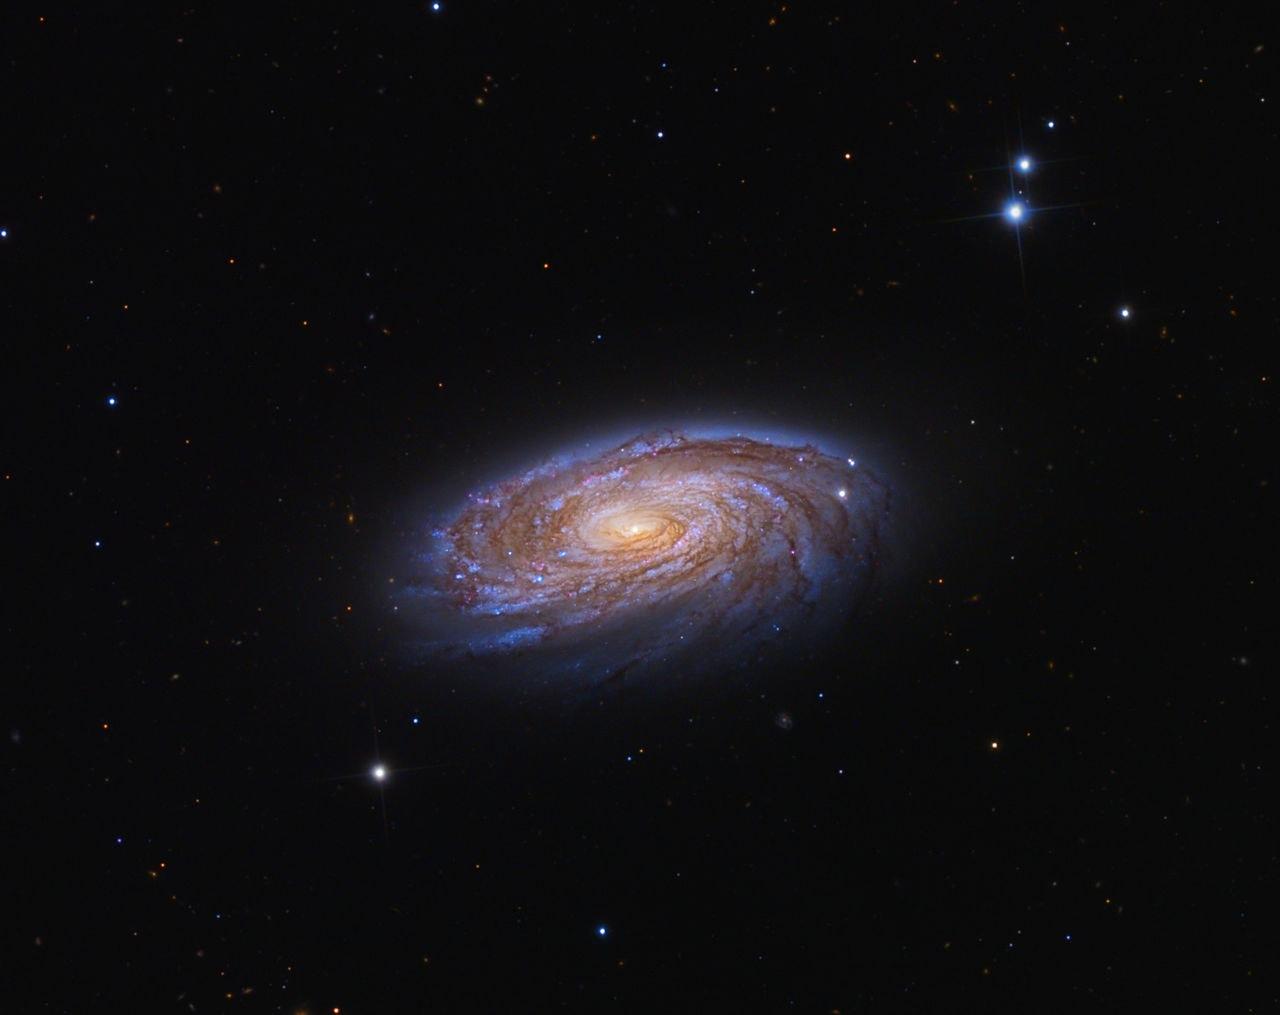 m88,m88 galaxy,ngc 4501